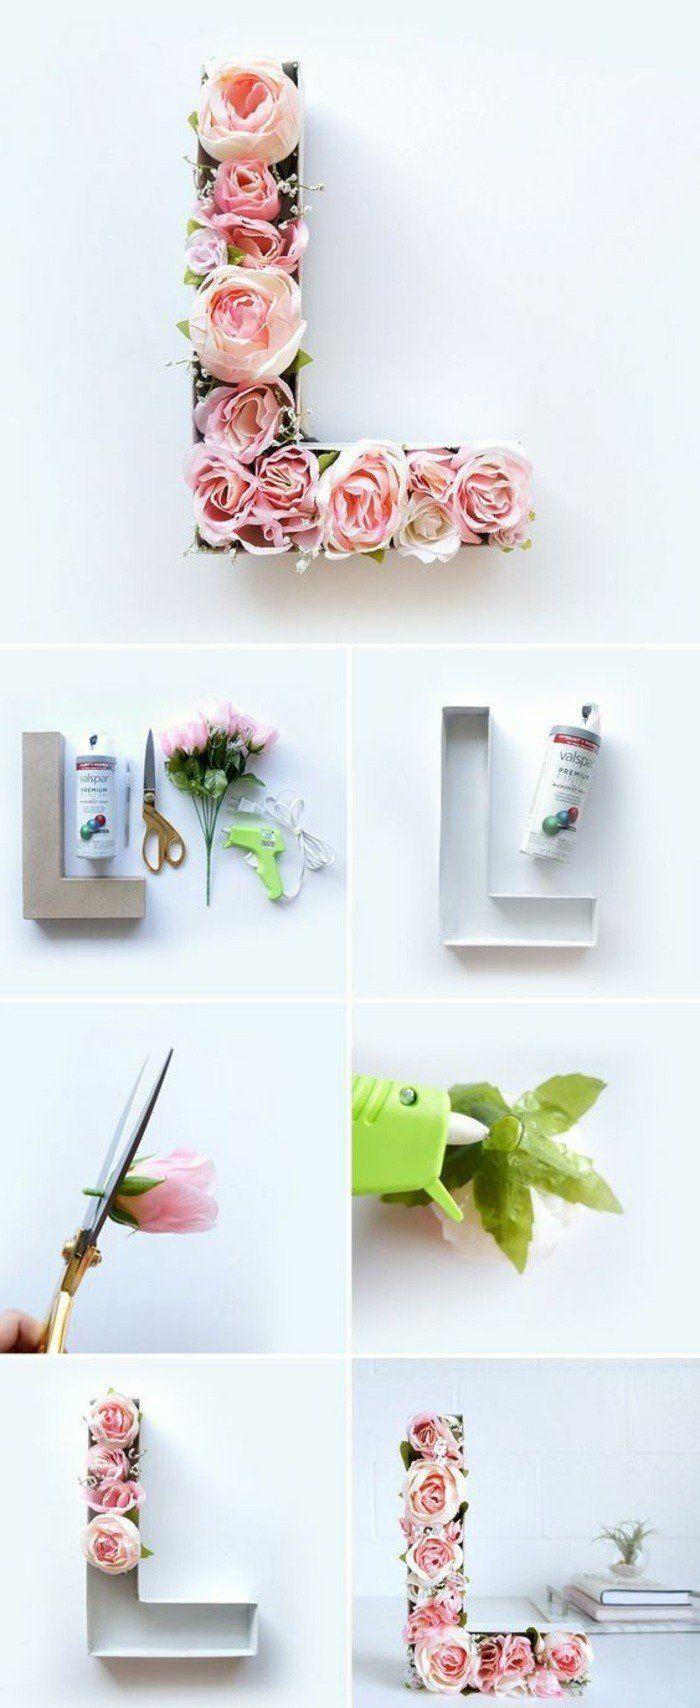 Kreative Wanddeko Neu ▷ 1001 Ideen Wie Sie Eine Kreative Wanddeko Selber